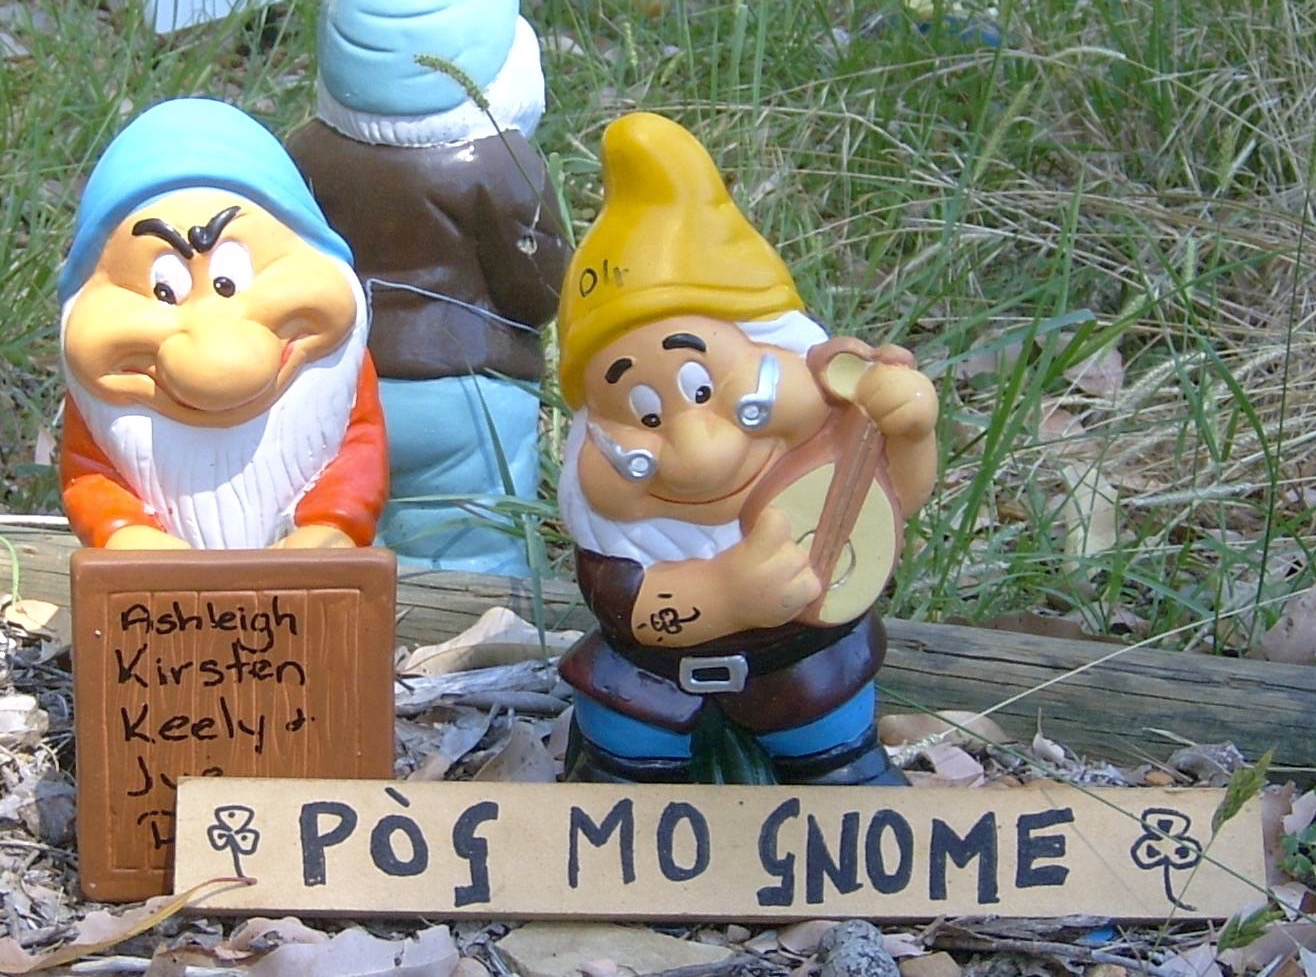 pog mo gnome